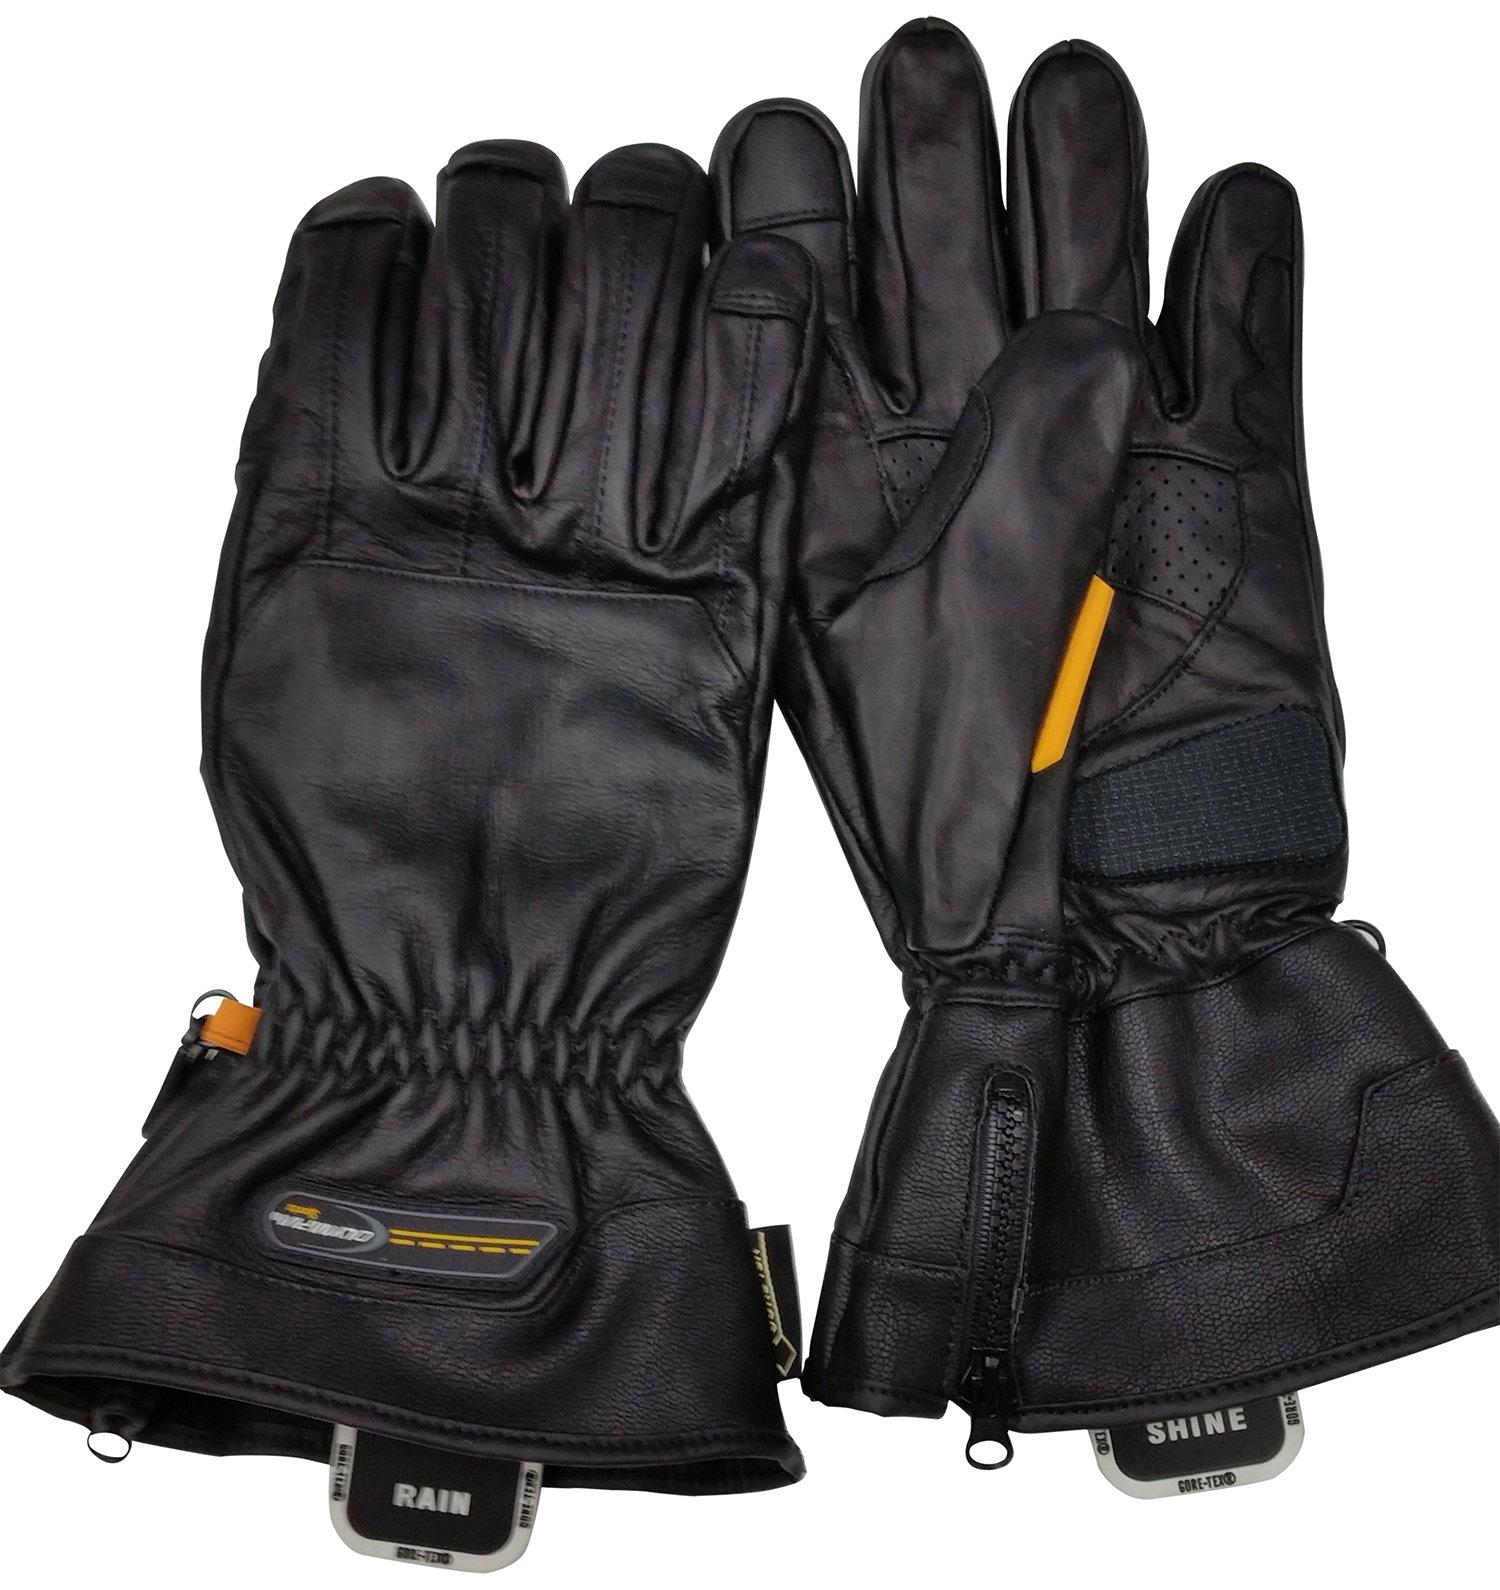 Olympia Sports Men's Gore-Tex Rain or Shine Gloves (Black, XX-Large)